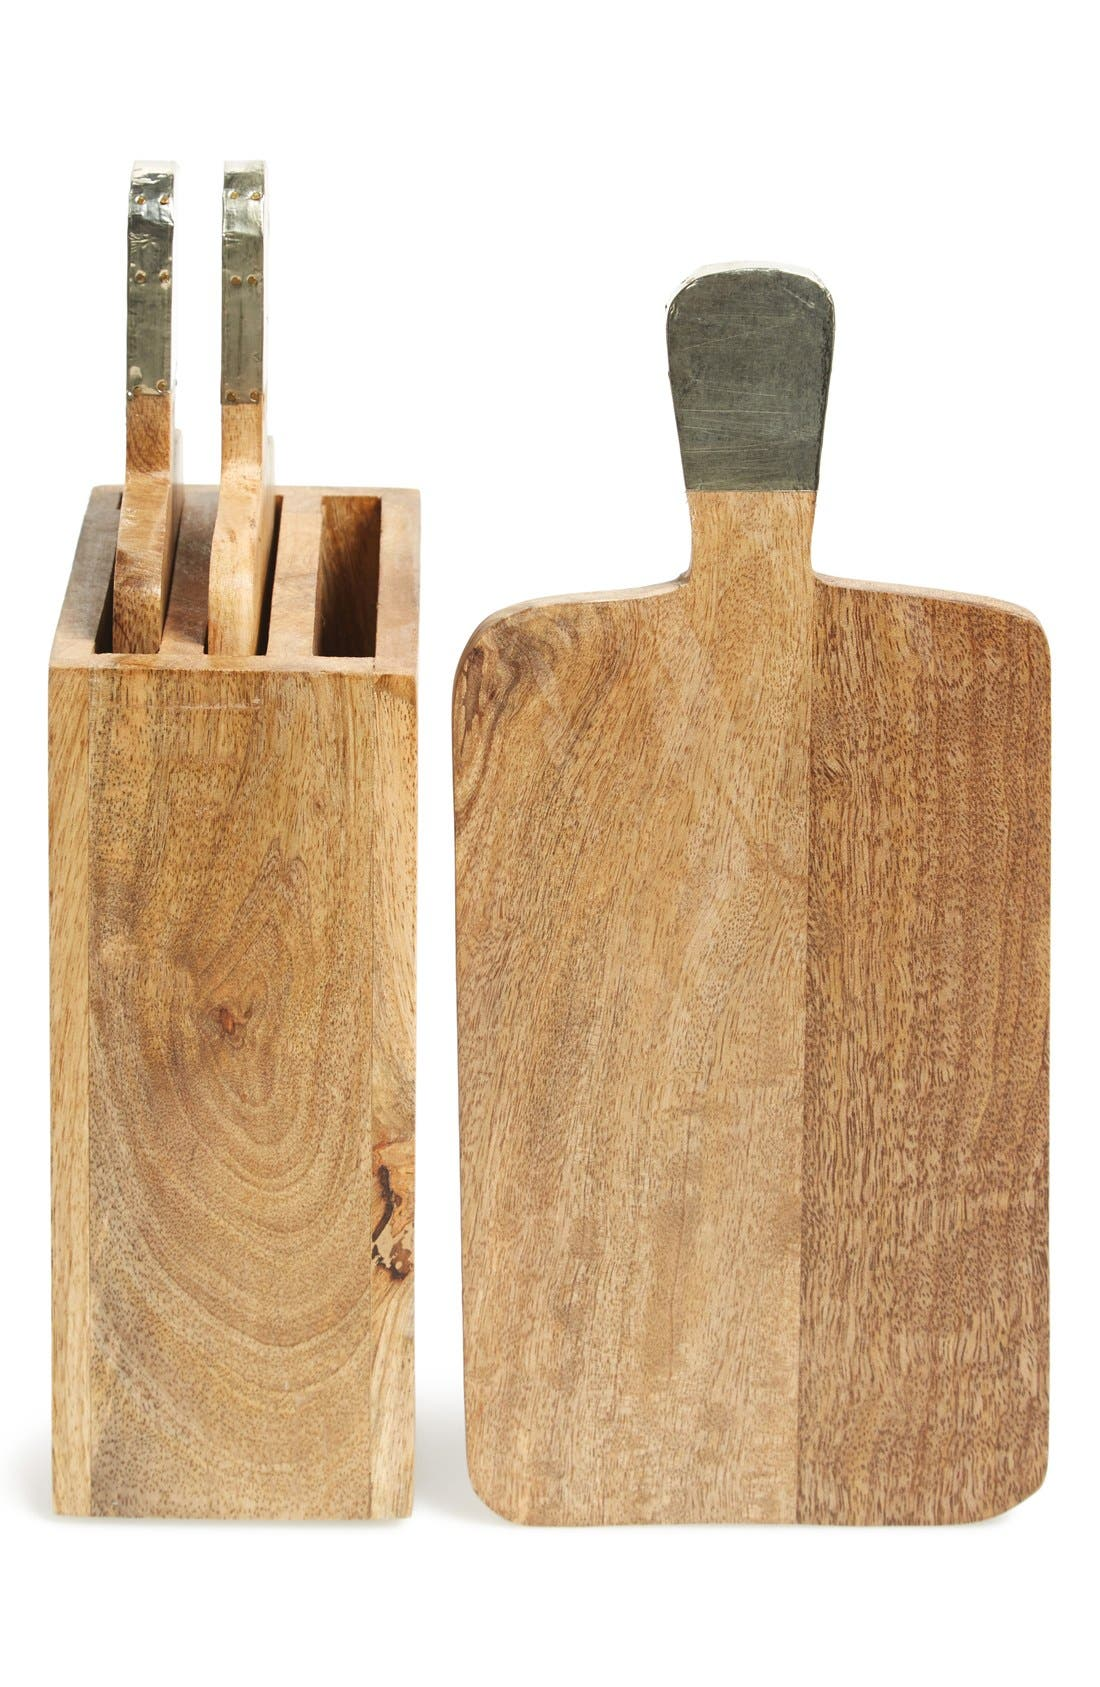 'Urban Farm' Mango Wood Serving Boards & Holder,                             Main thumbnail 1, color,                             200